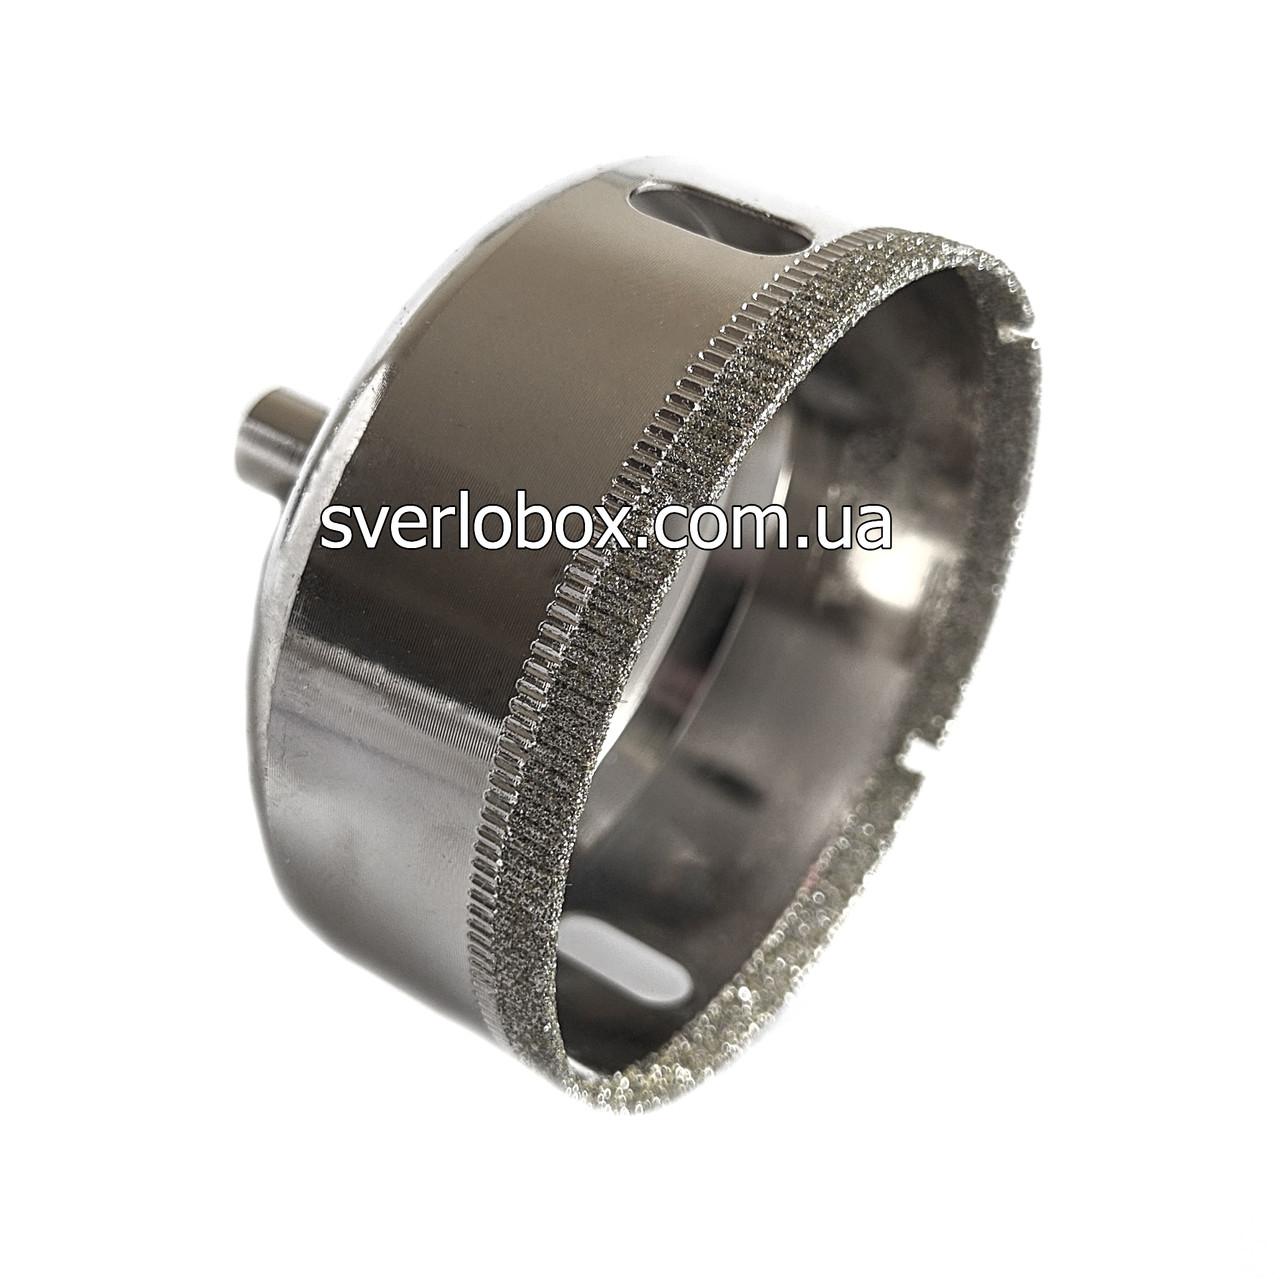 Коронка алмазная 160 мм